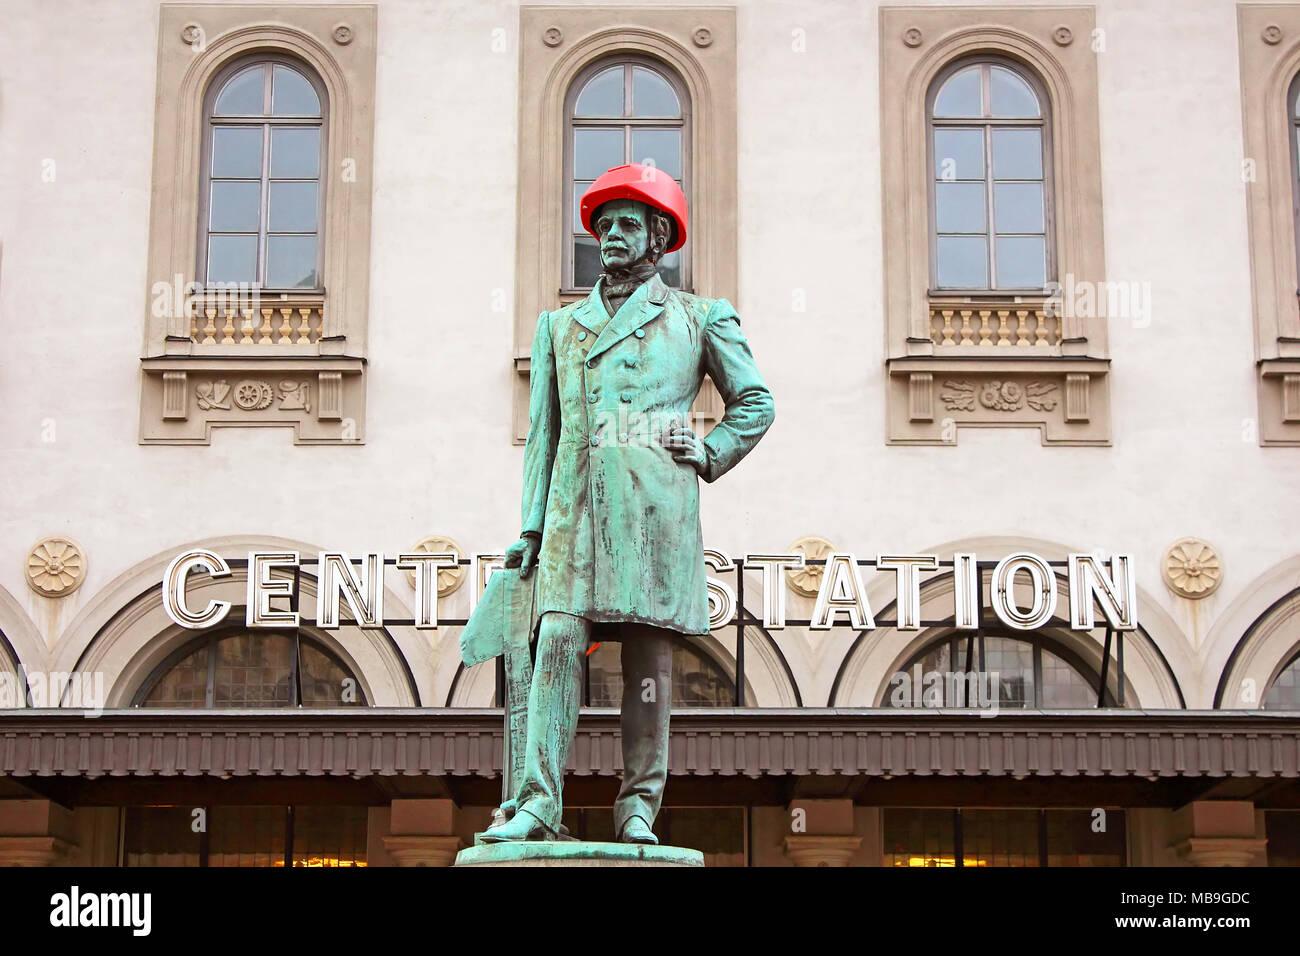 STOCKHOLM, SWEDEN - OCTOBER 17, 2013: Satue of Nils Ericson in front of Central station in Stockholm - Stock Image